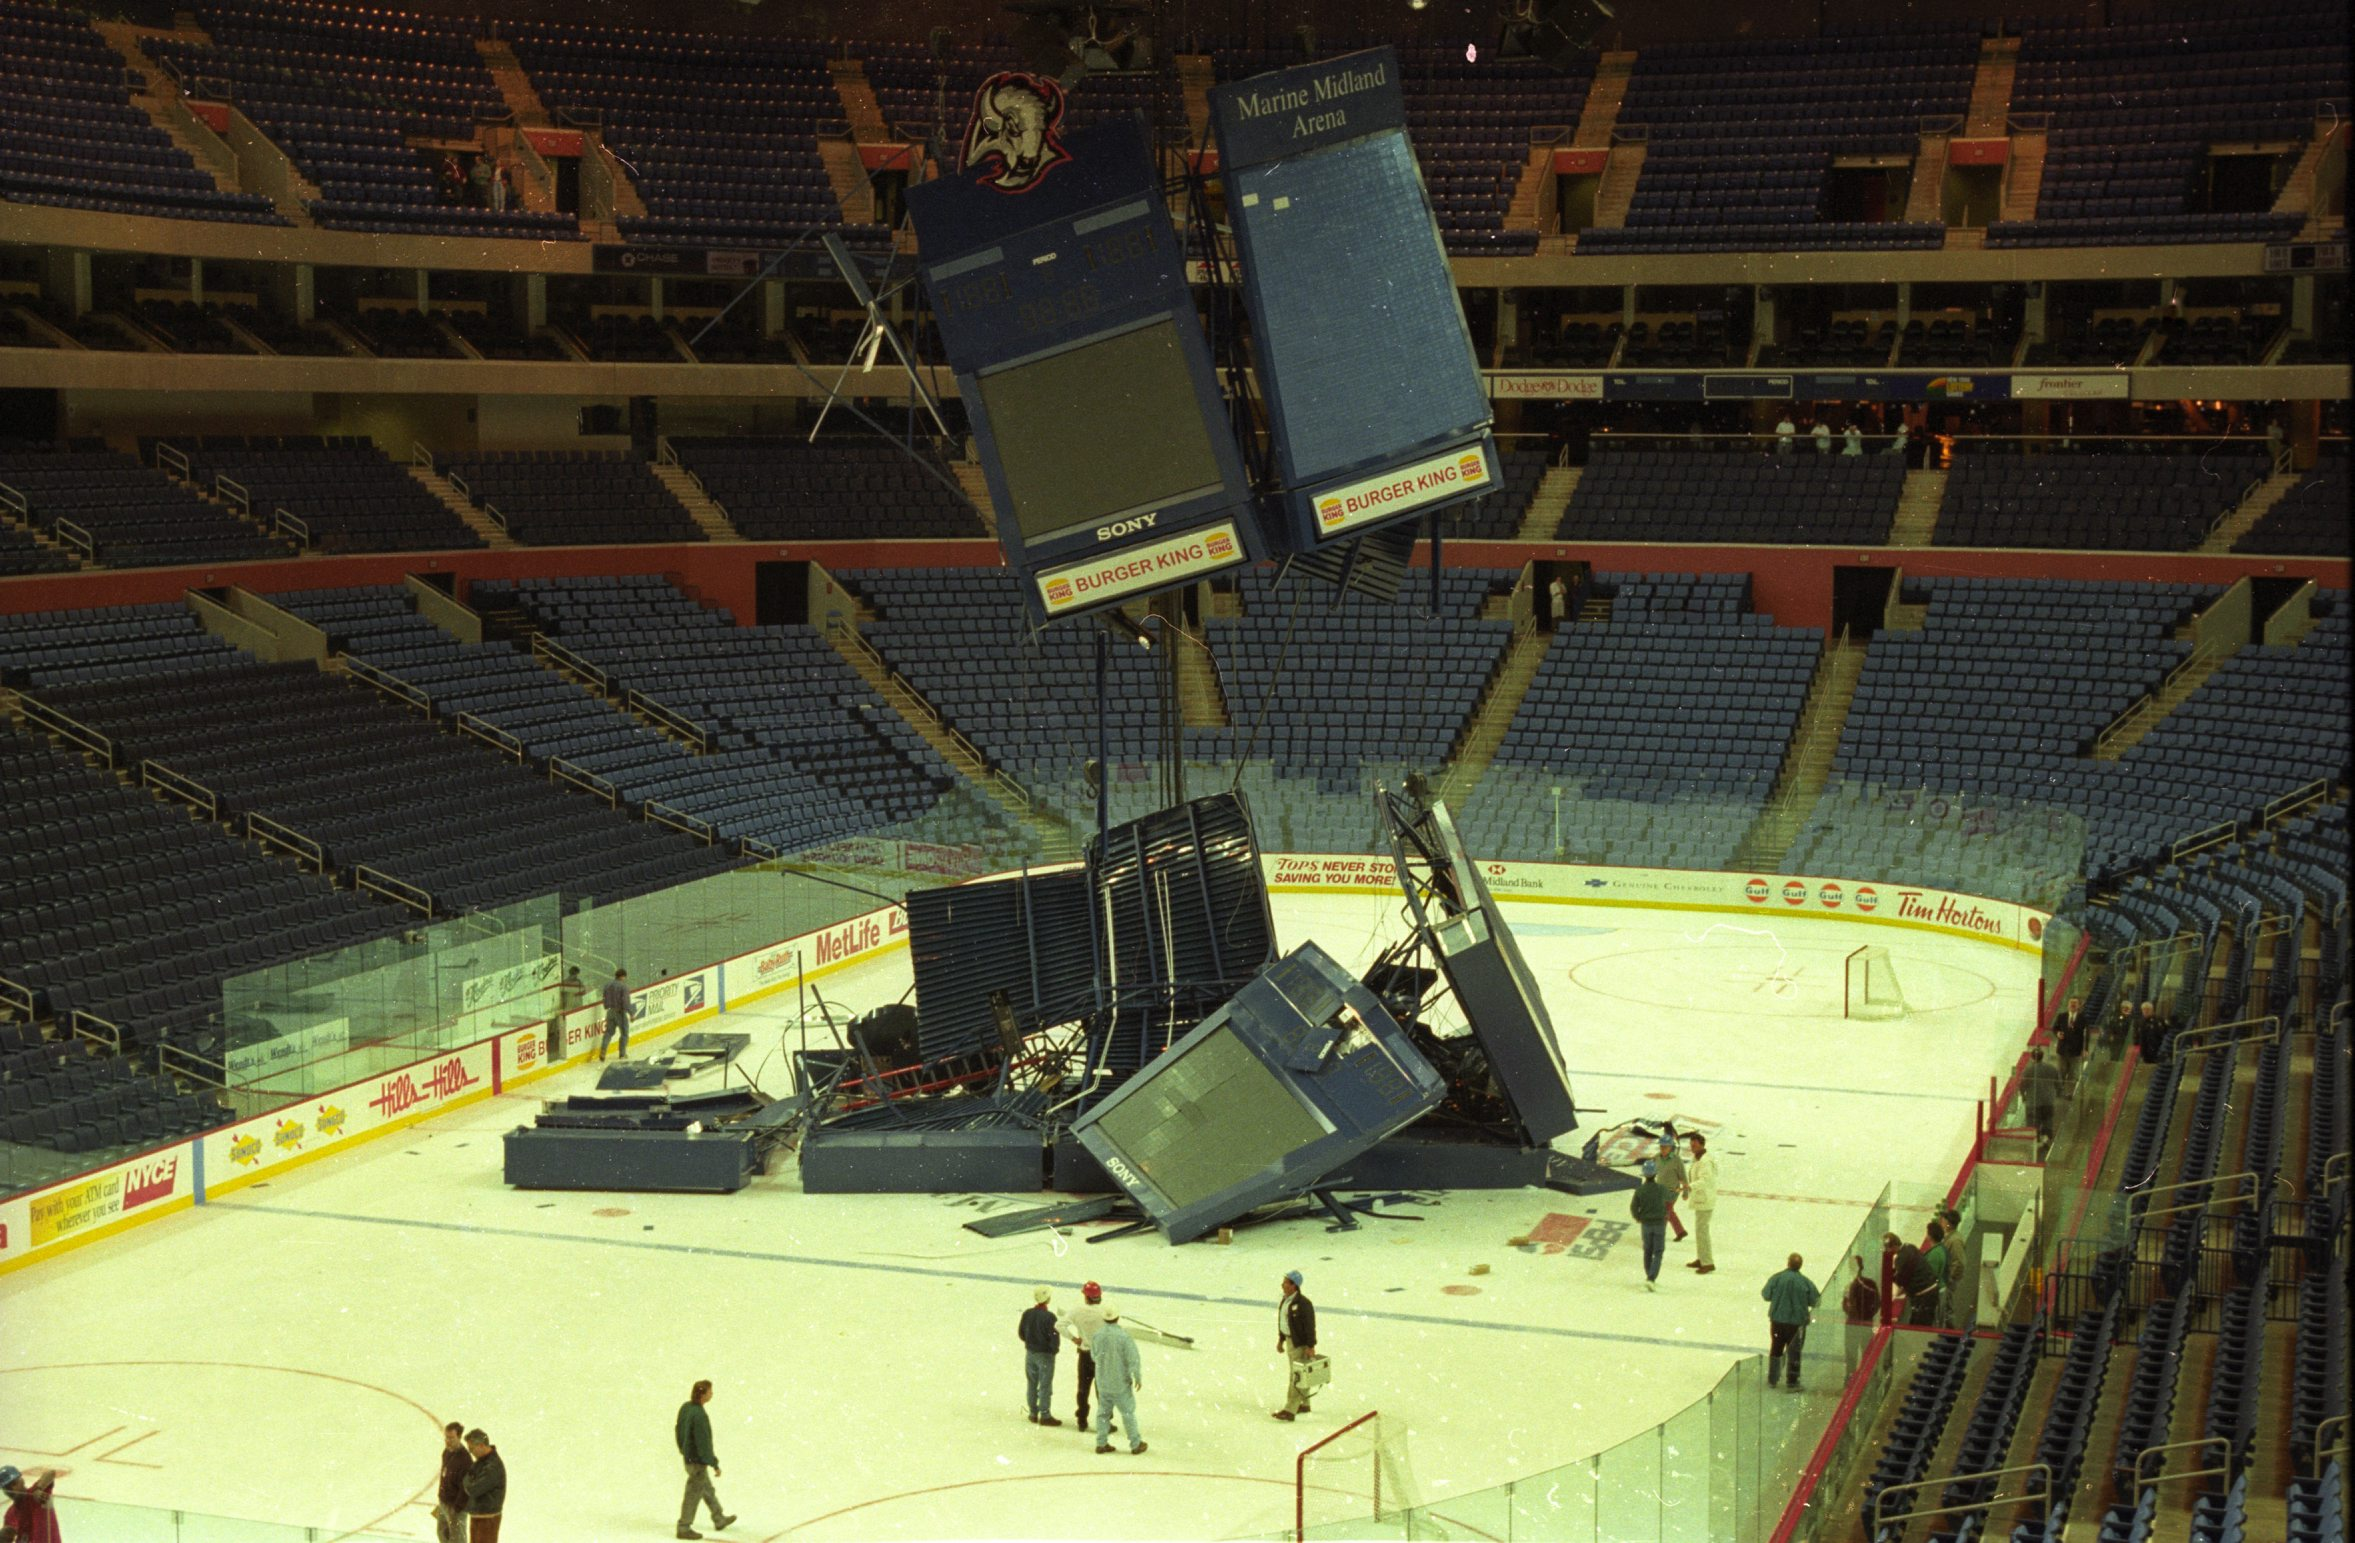 Jumbotron Crash, 11.16.96 - photo by Scull